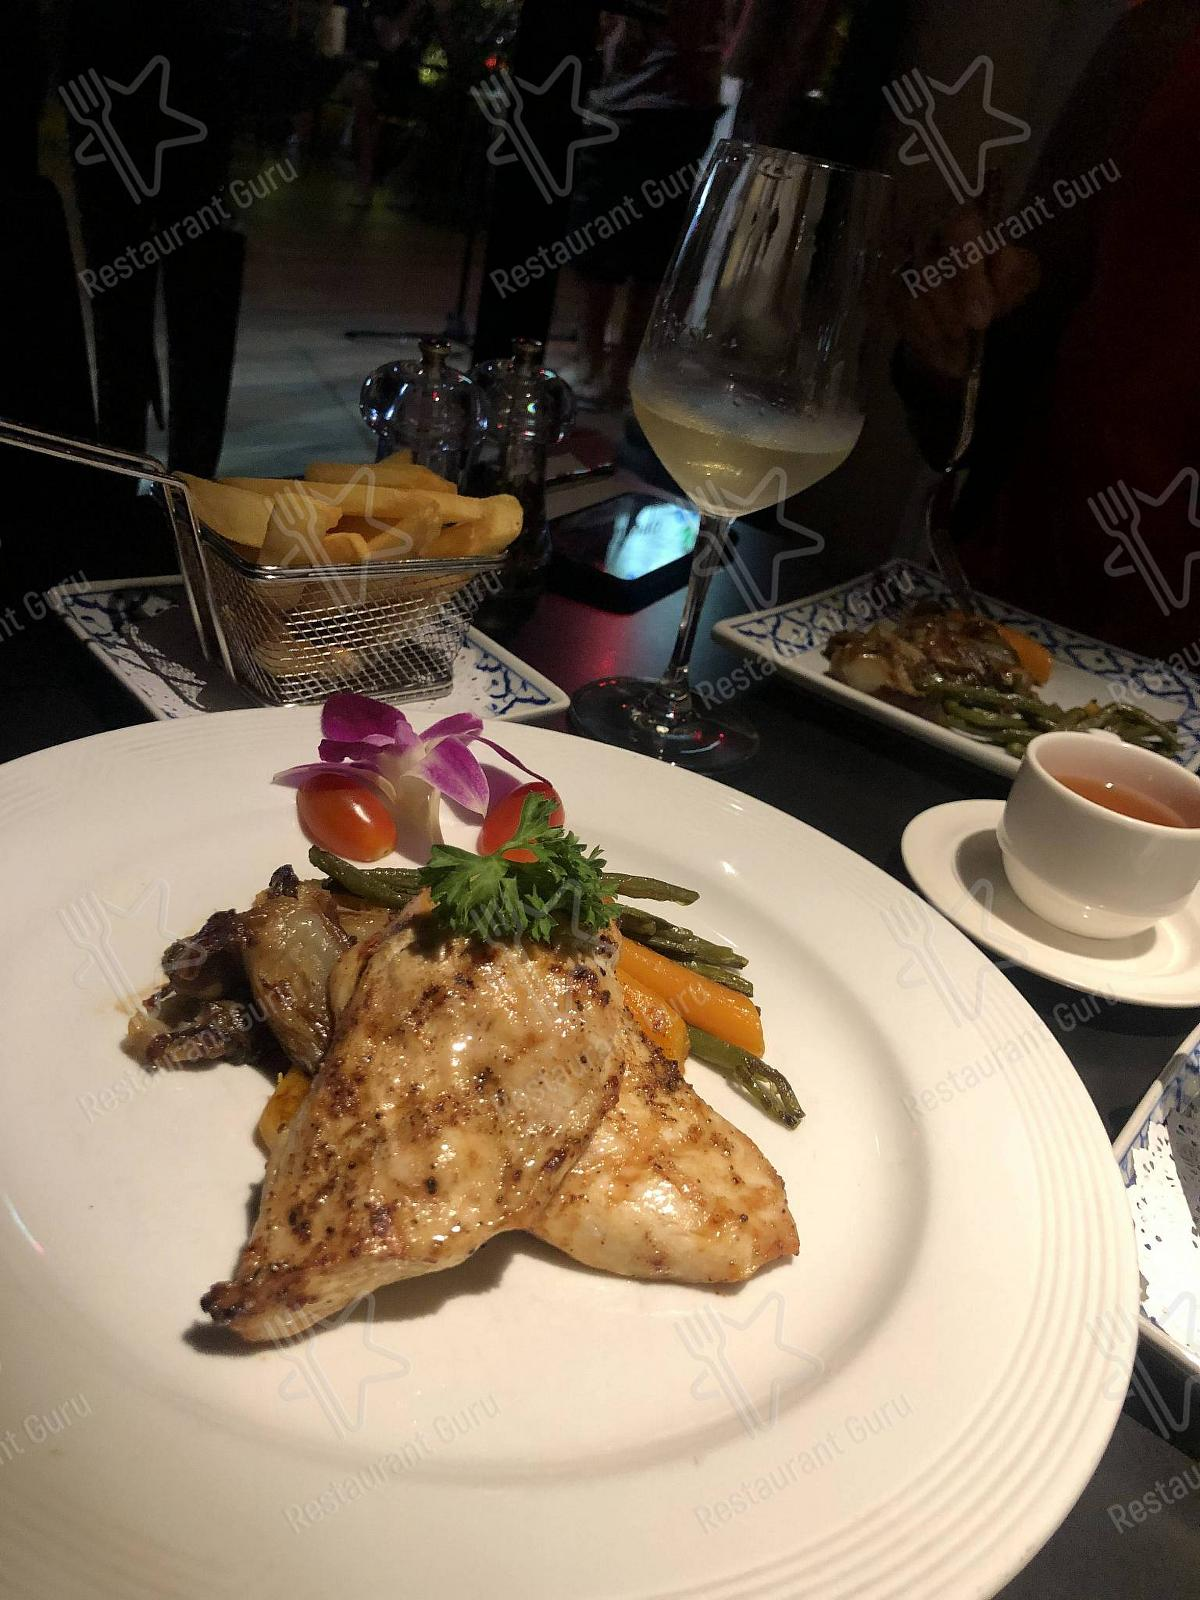 Mai Thai Cuisine menu - meals and drinks